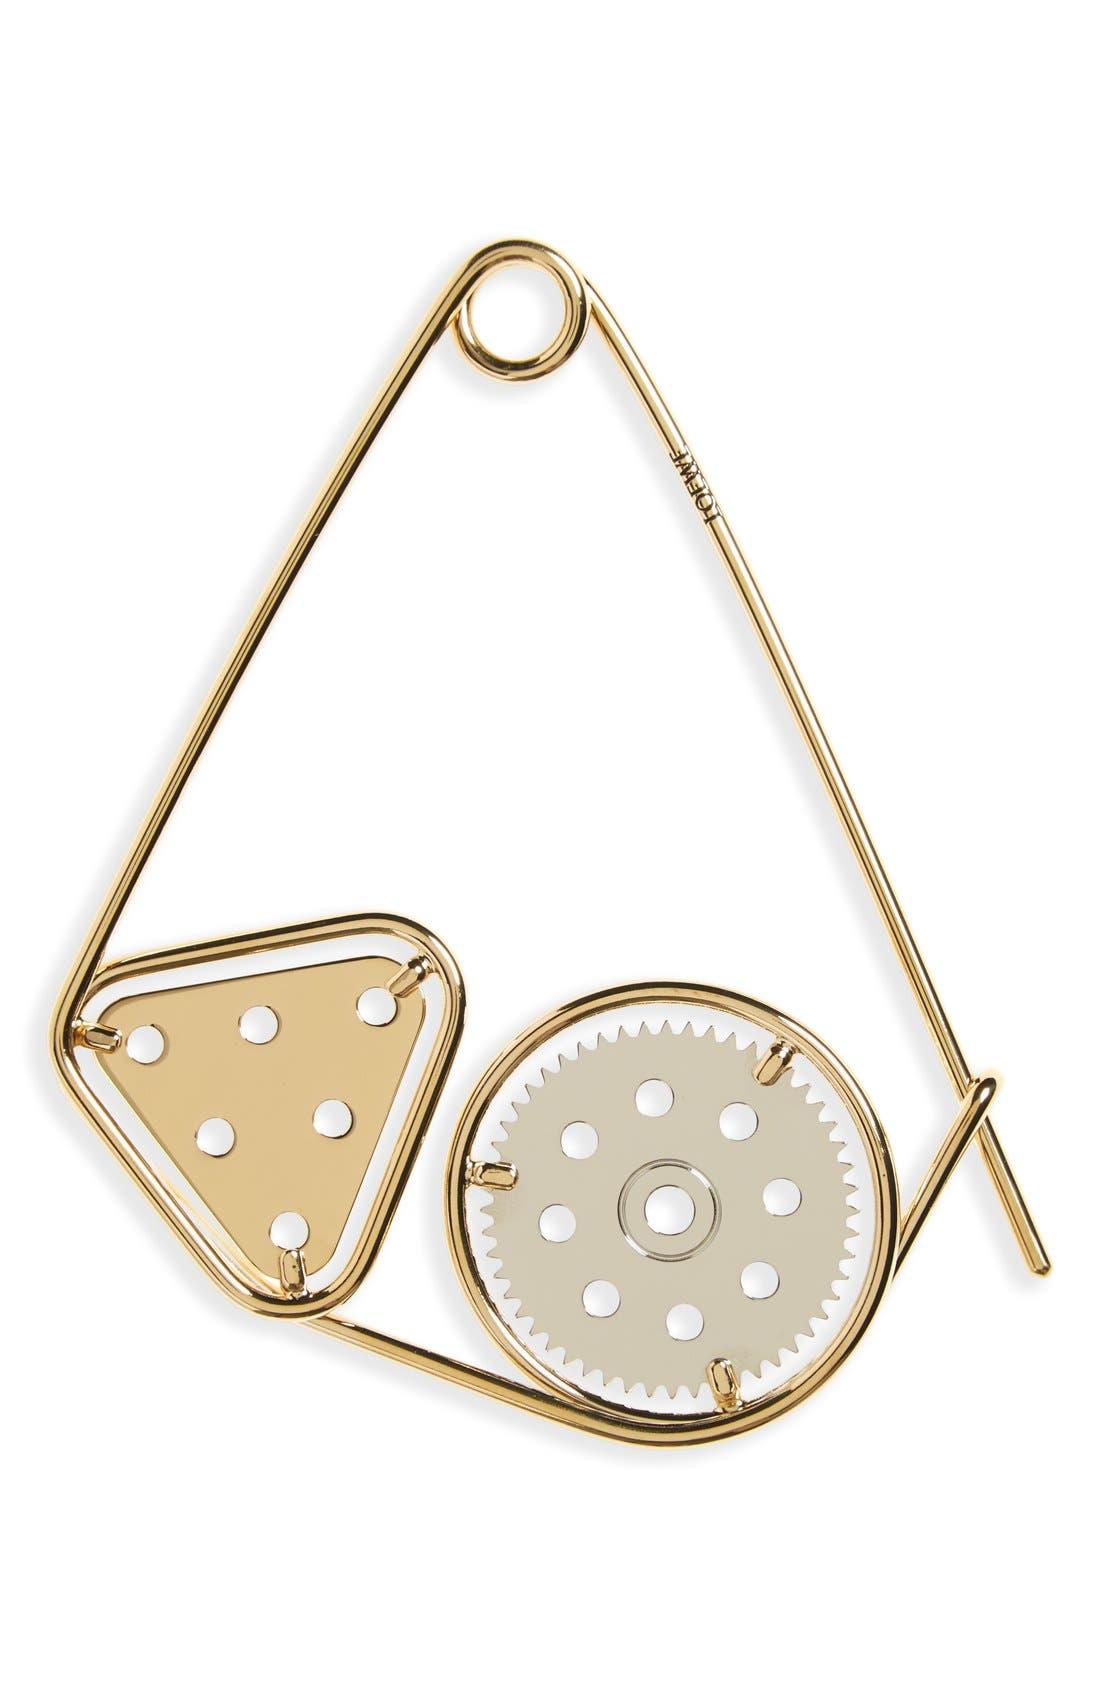 'Meccano' Double Pin Bag Charm,                         Main,                         color, 710